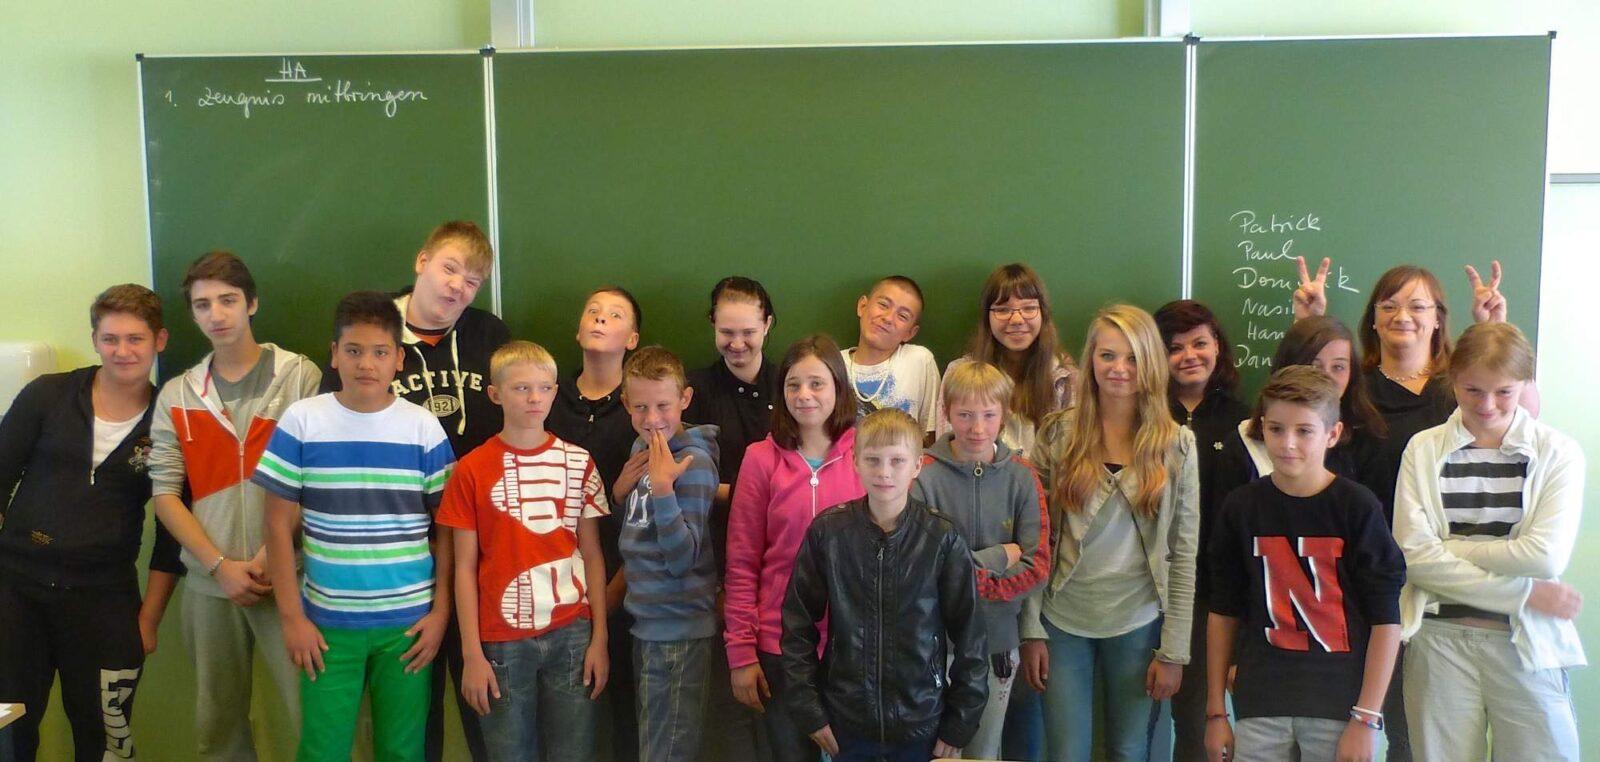 klasse-7a-2014ulk